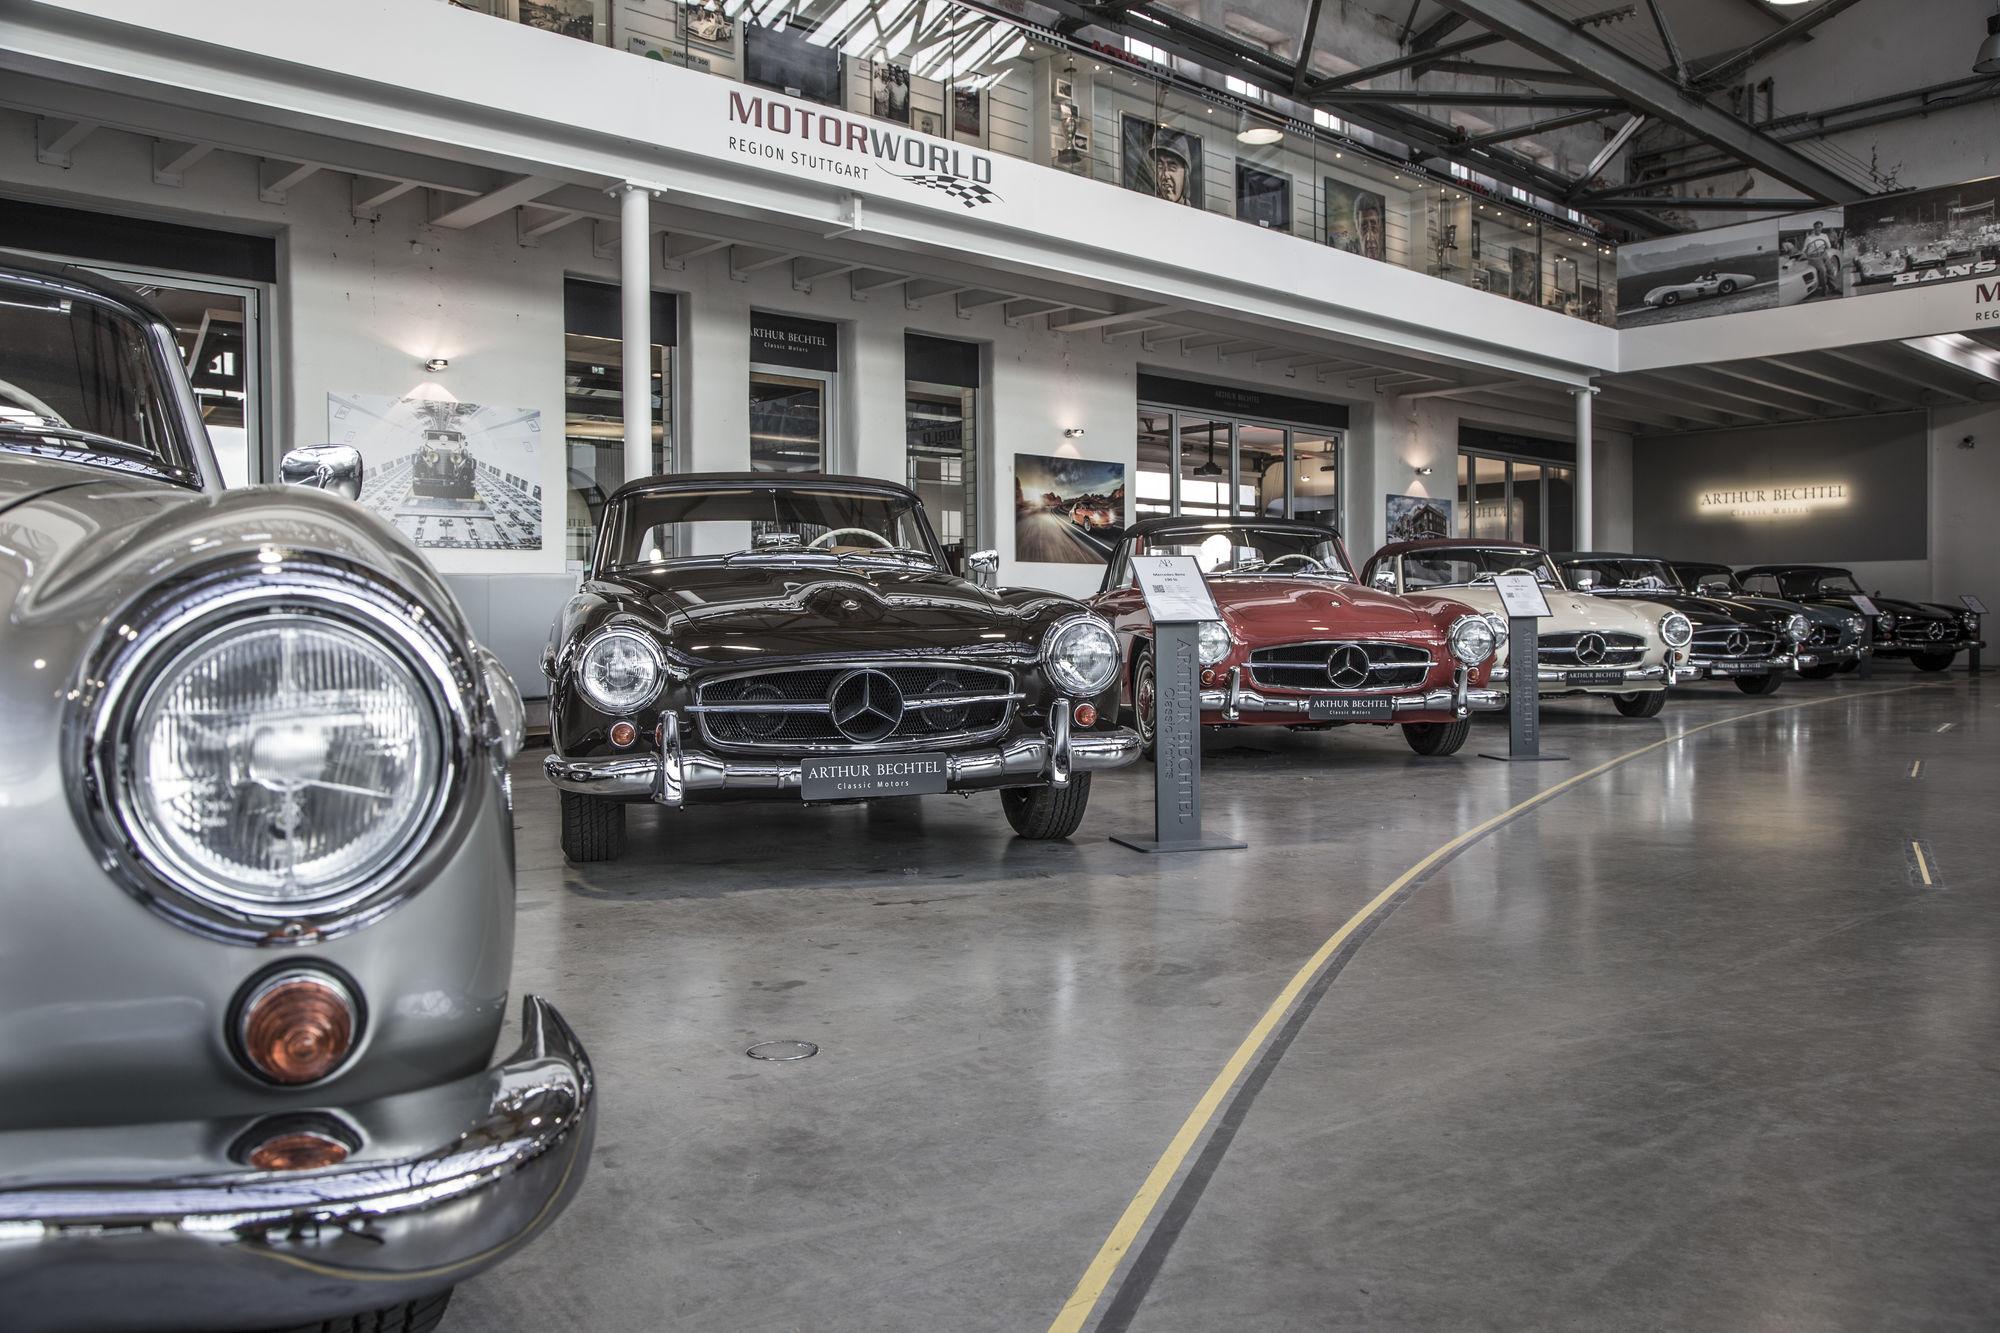 Arthur Bechtel Classic Motors in der Motorworld